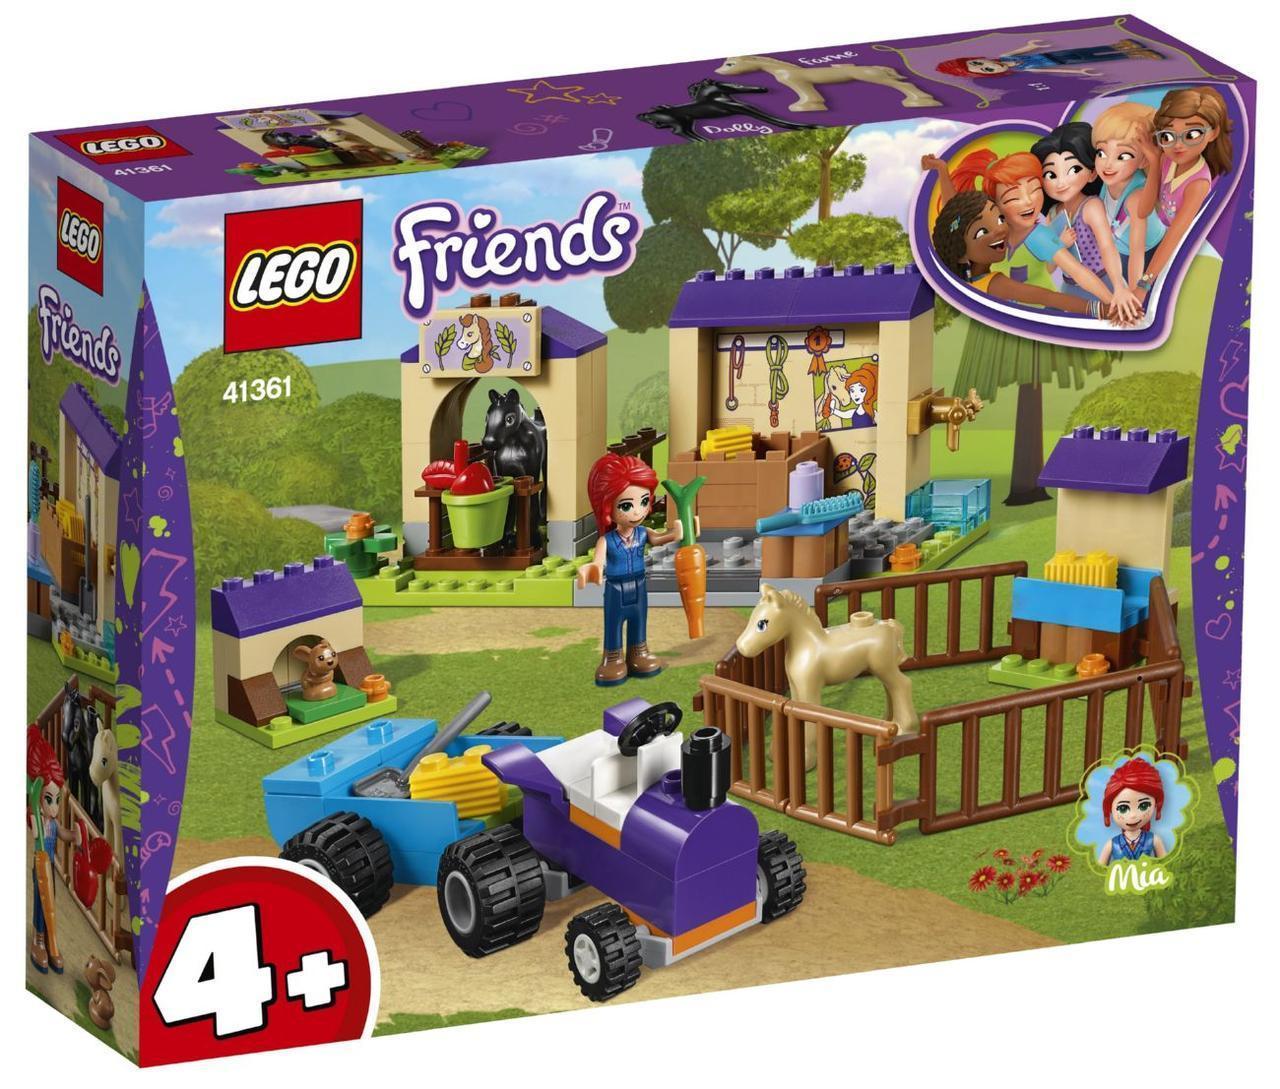 Lego Friends Конюшня для жеребят Мии 41361